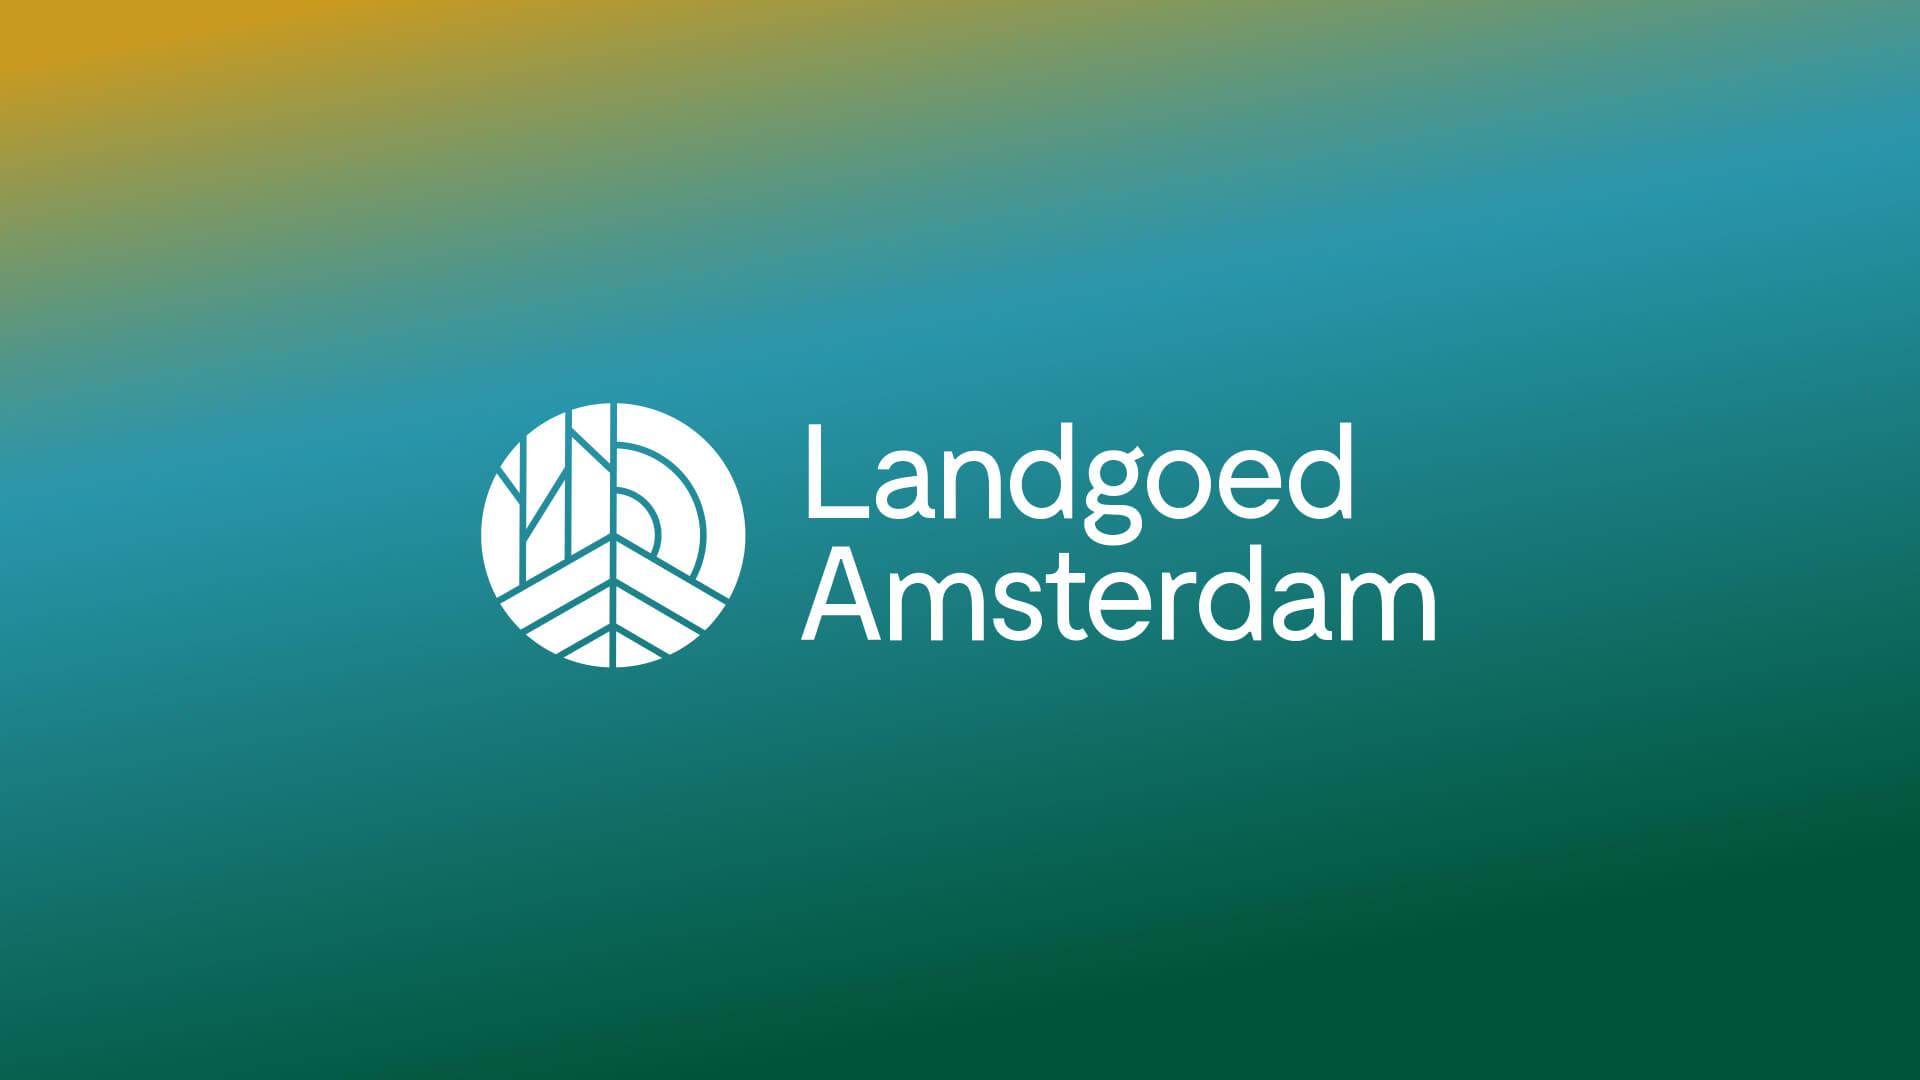 LL_Landgoed_slider_logo_gradient